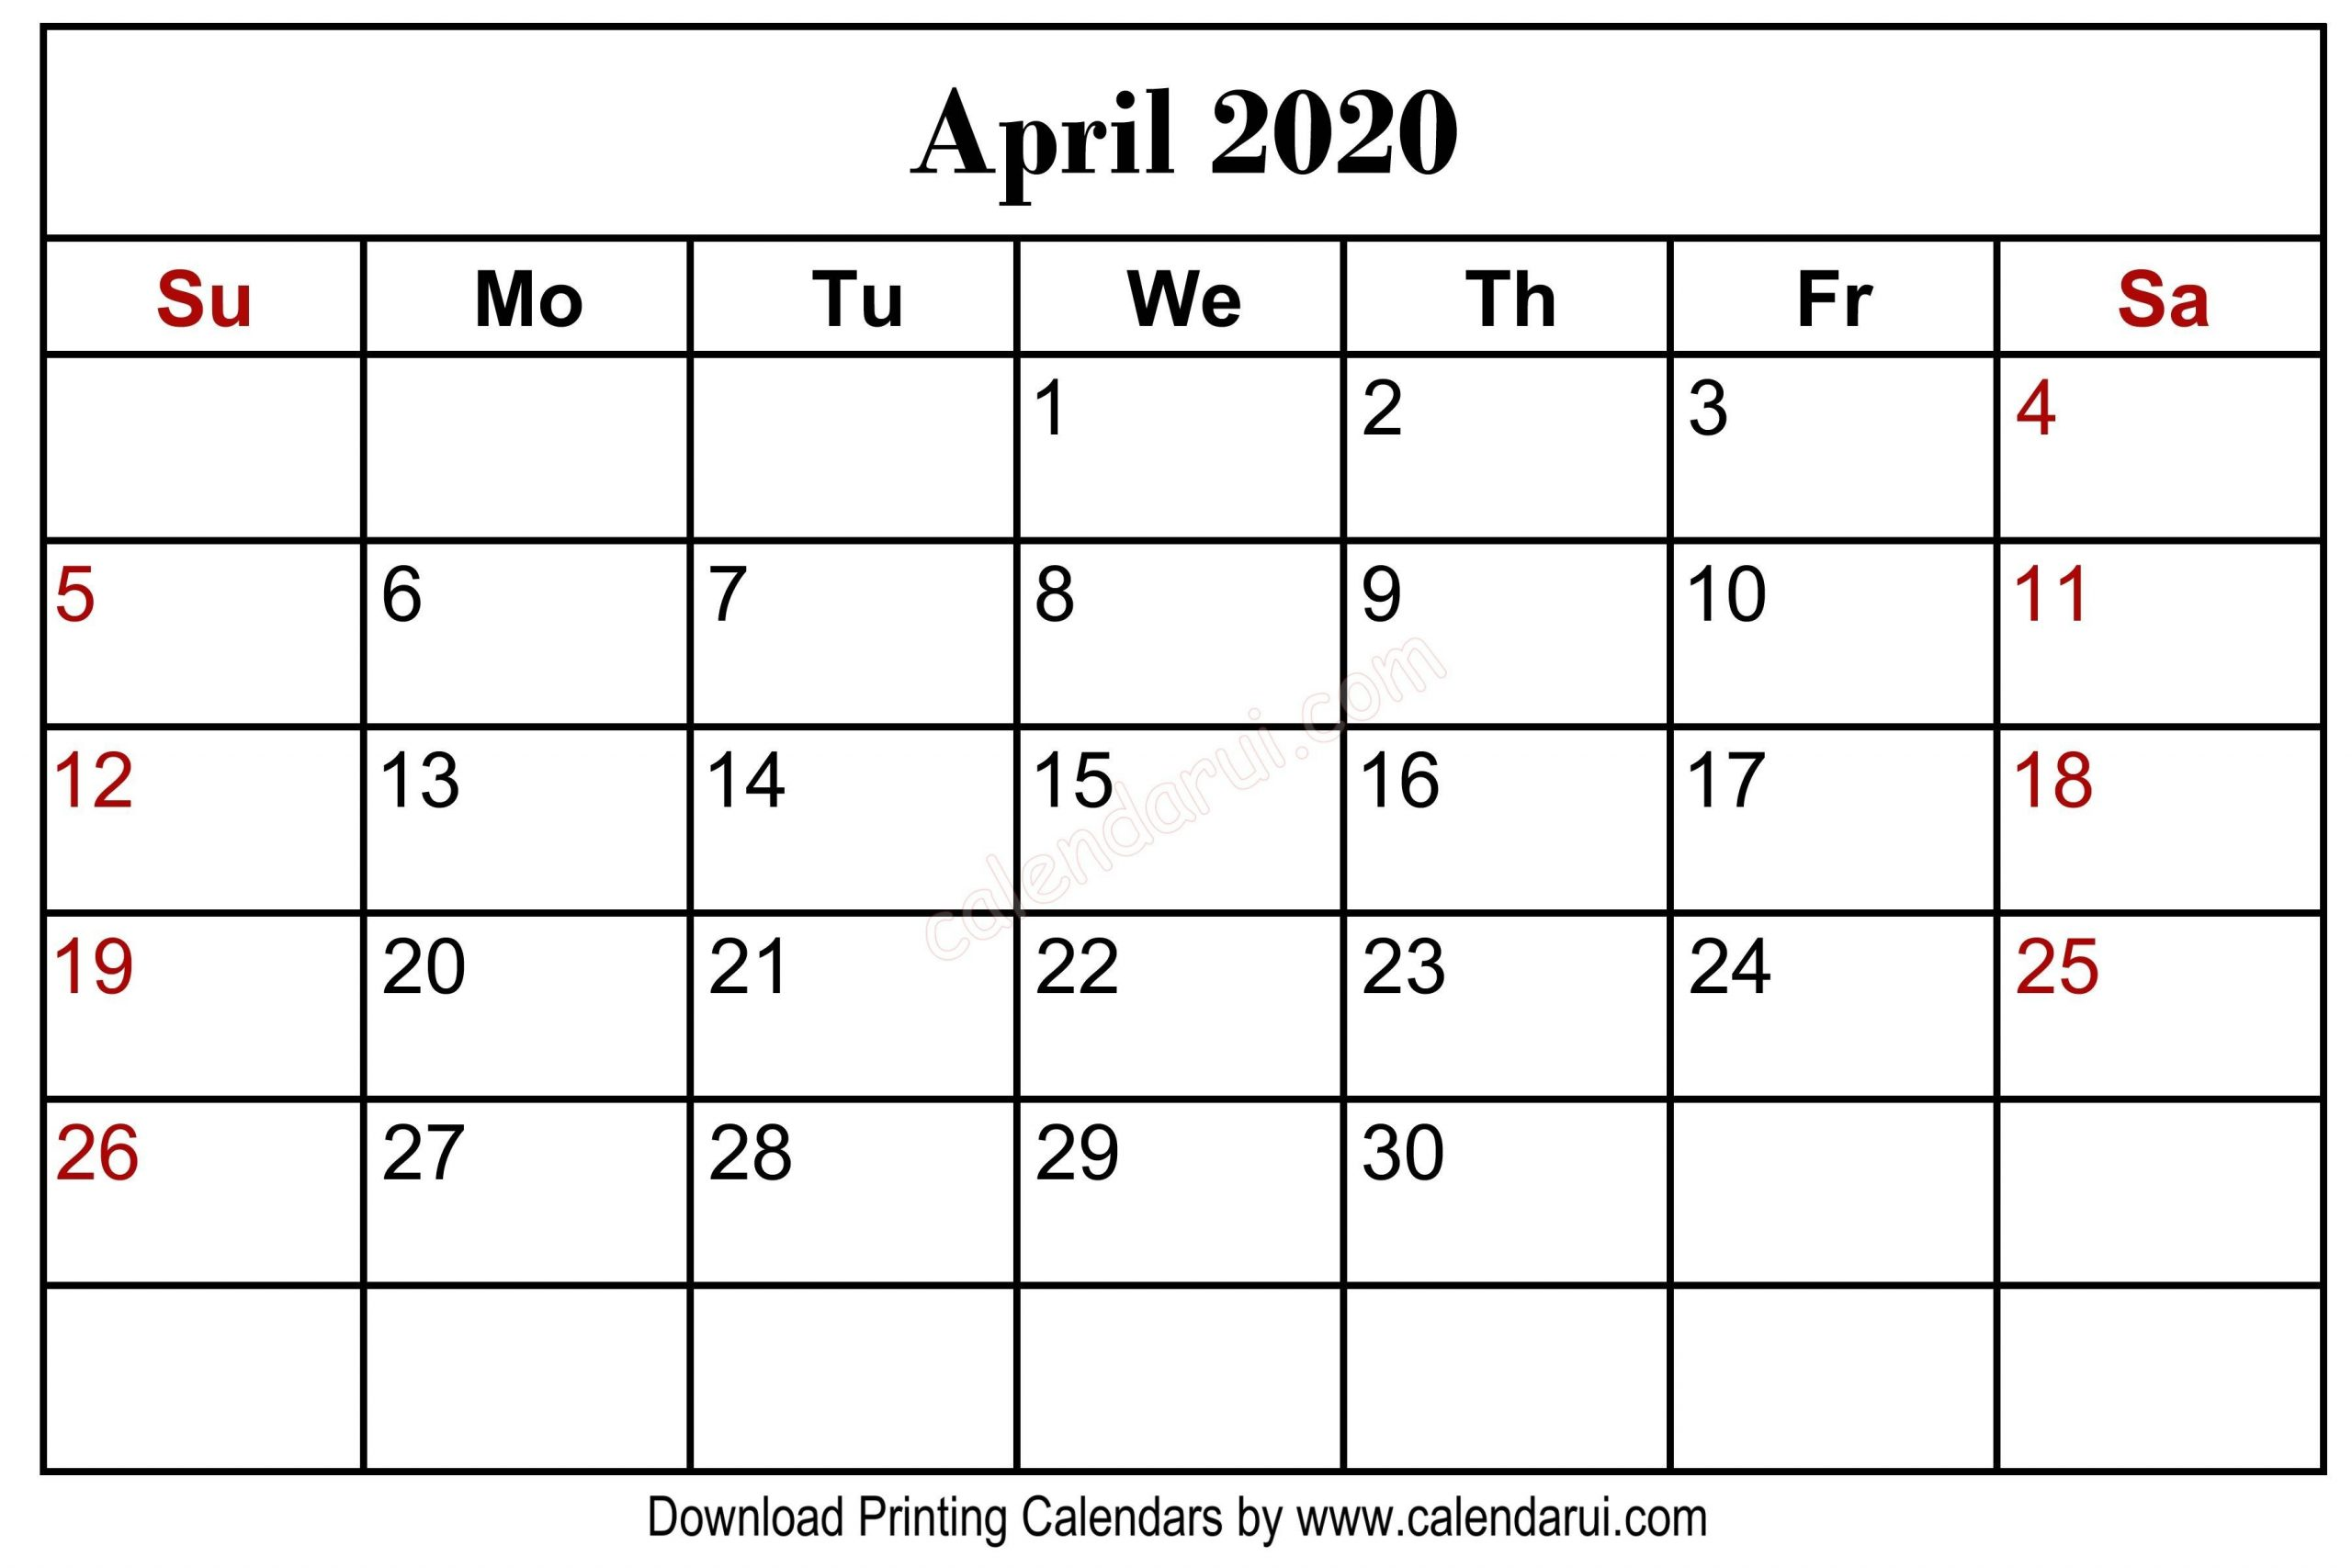 11 x 8 5 calendar pages 2020 free | calendar template